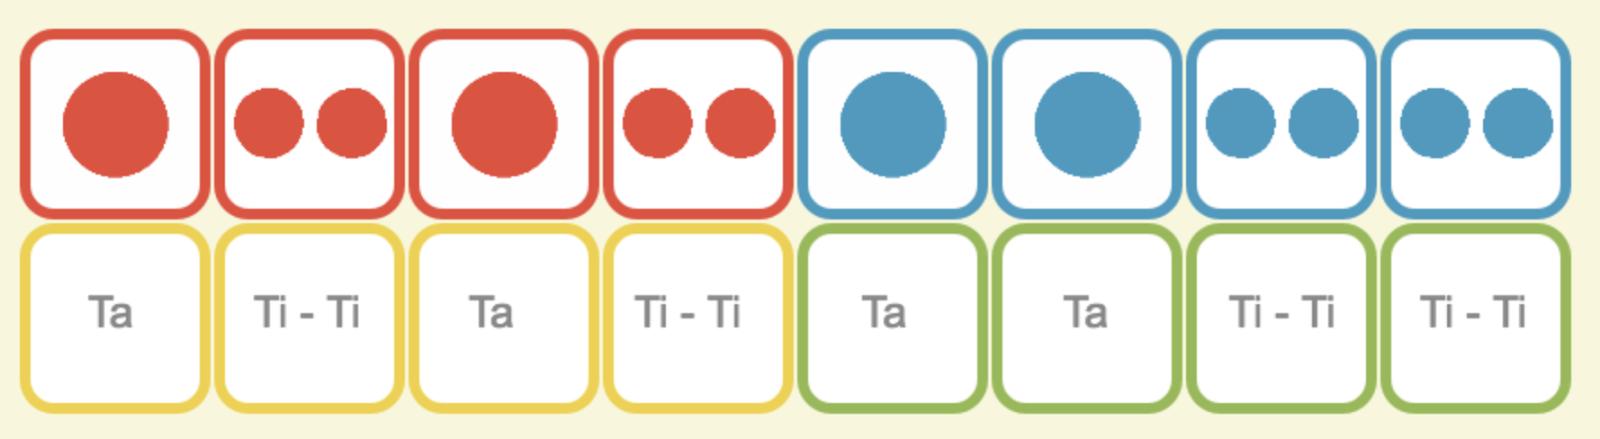 Rhythm syllables - Irish primary music curriculum